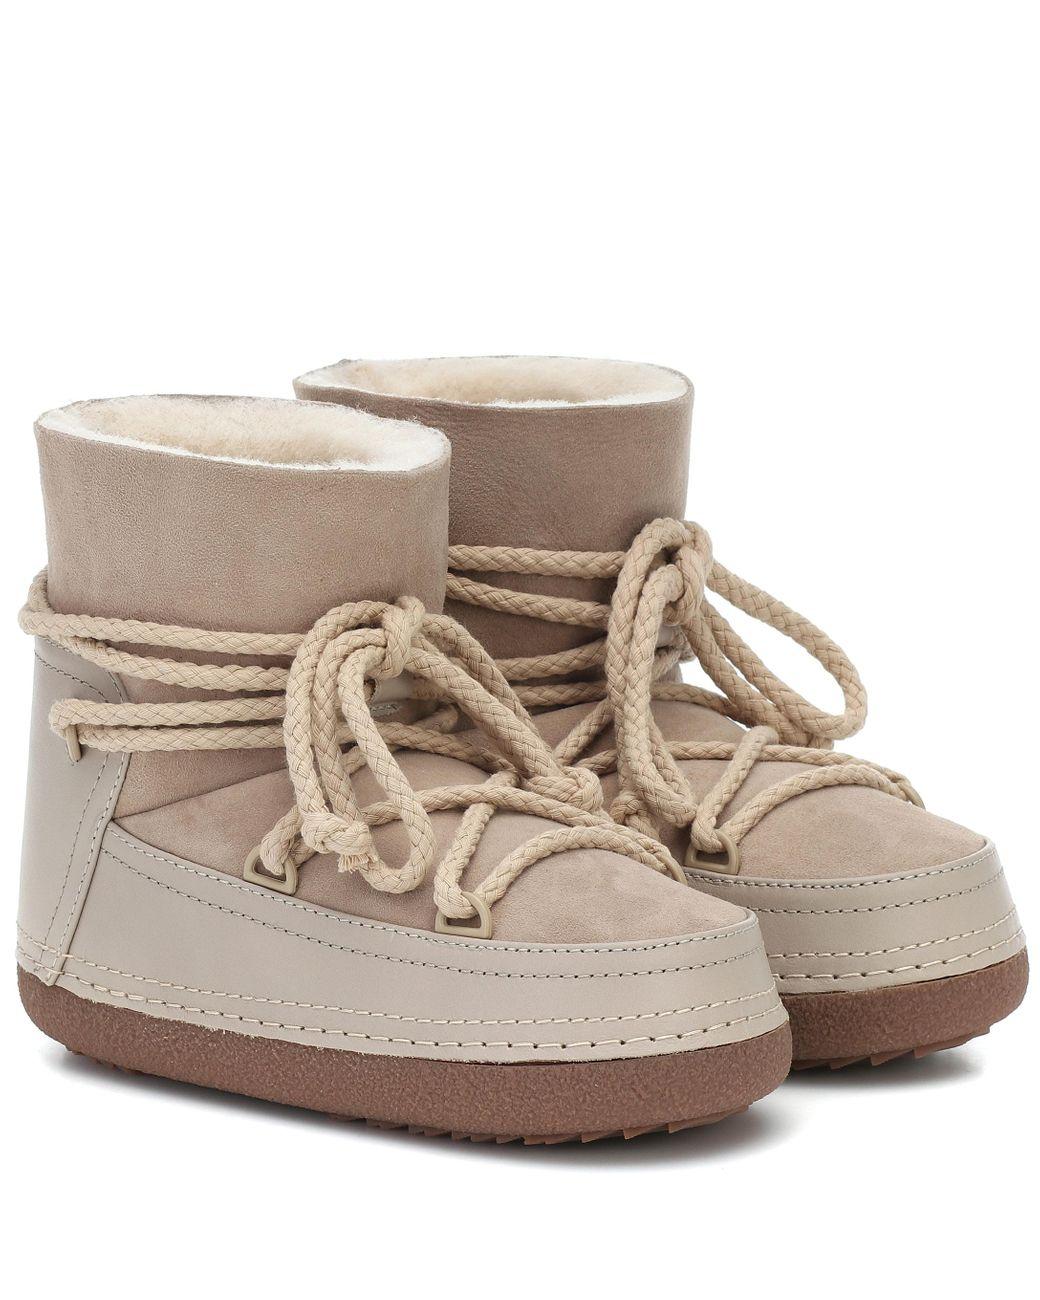 Natur Ankle Lyst Inuikii Classic Aus Veloursleder Boots In CxeBrdoW